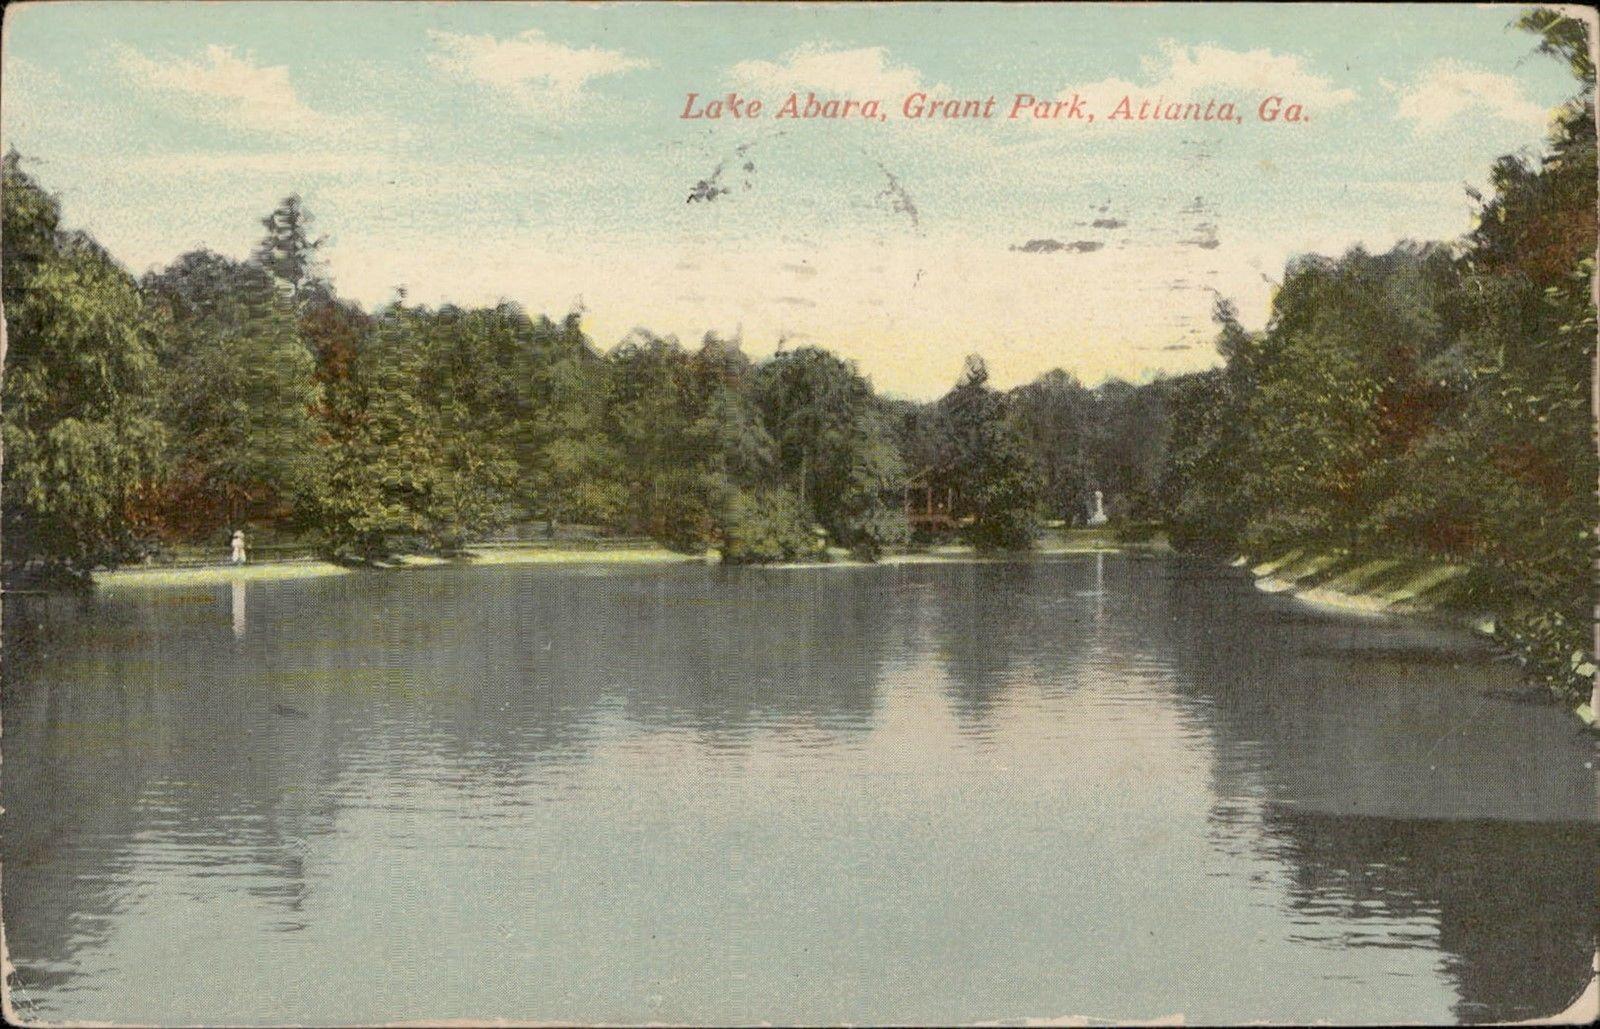 Lake Abana Grant Park Atlanta Georgia / HipPostcard